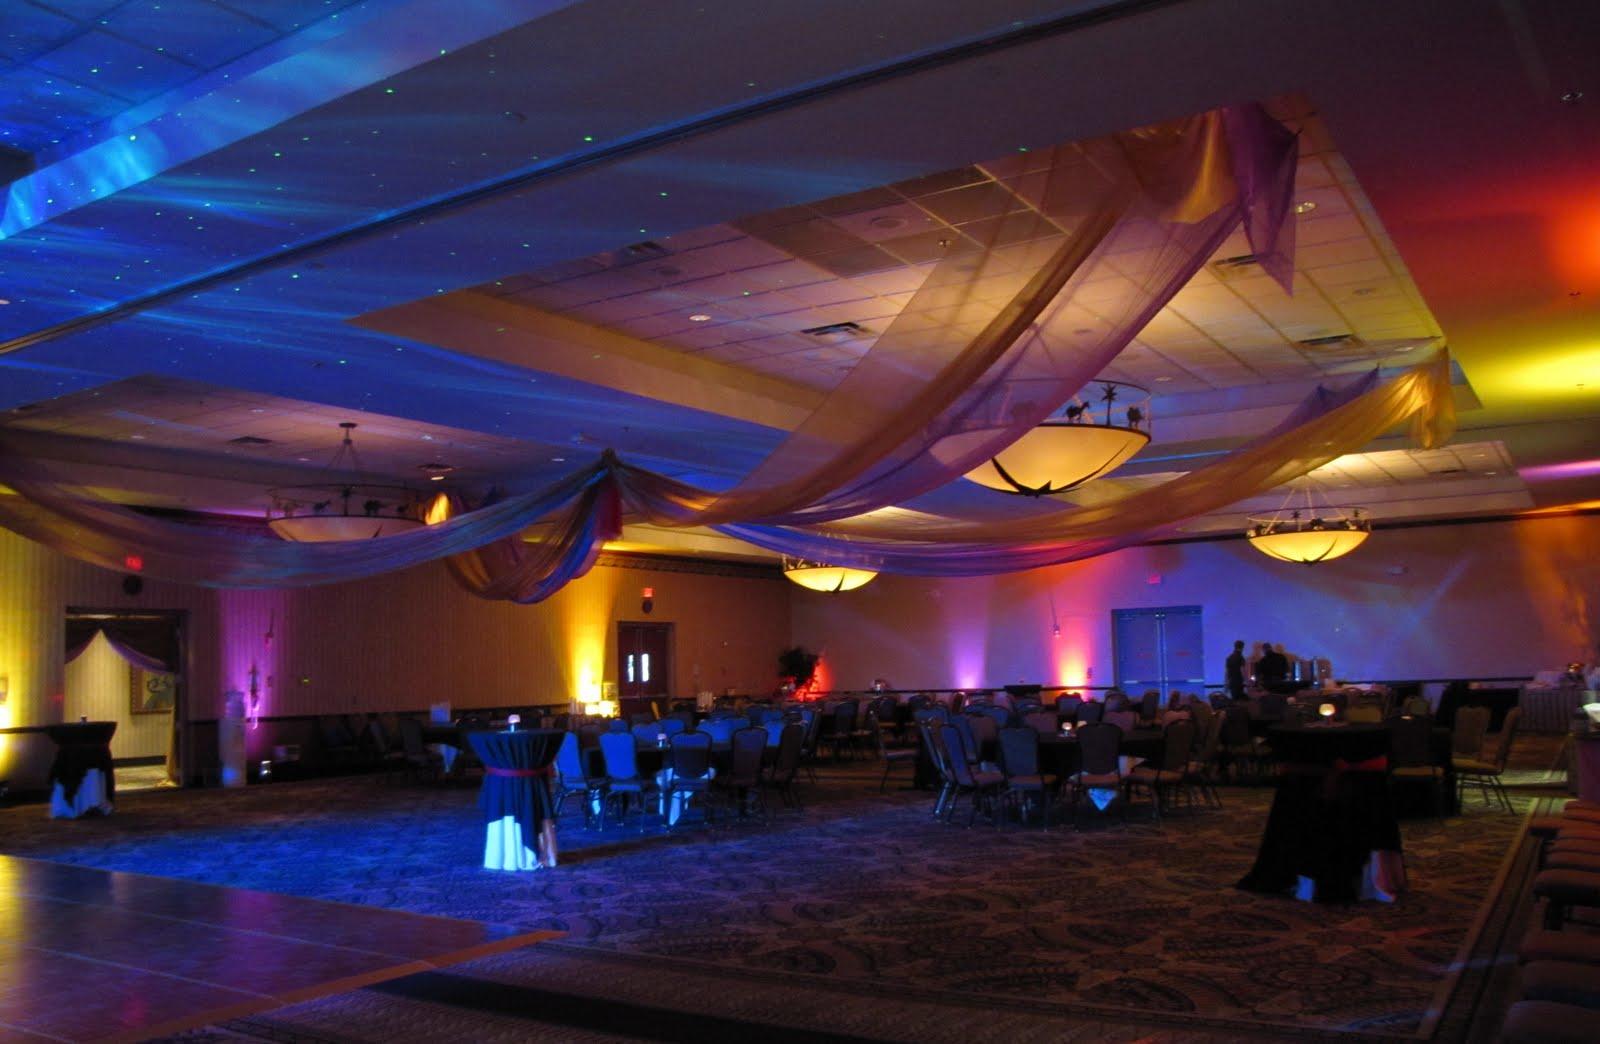 Party people event decorating company cypress creek arabian nights prom 2011 sheraton safari